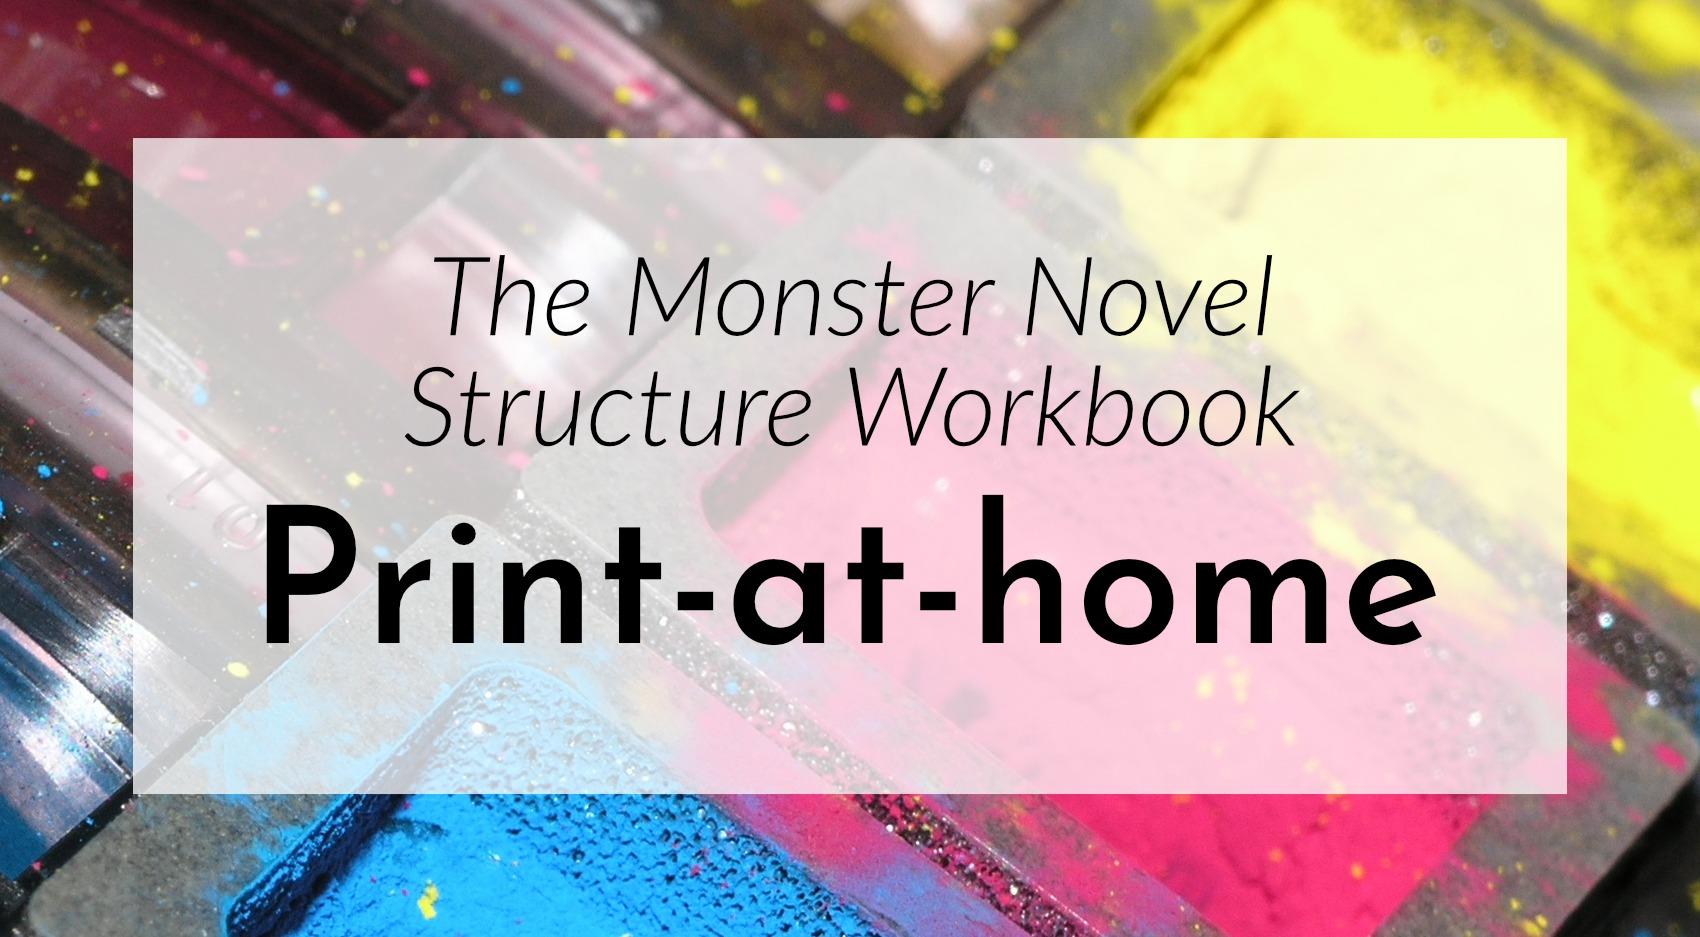 Print-at-home Monster Novel Structure Workbook!